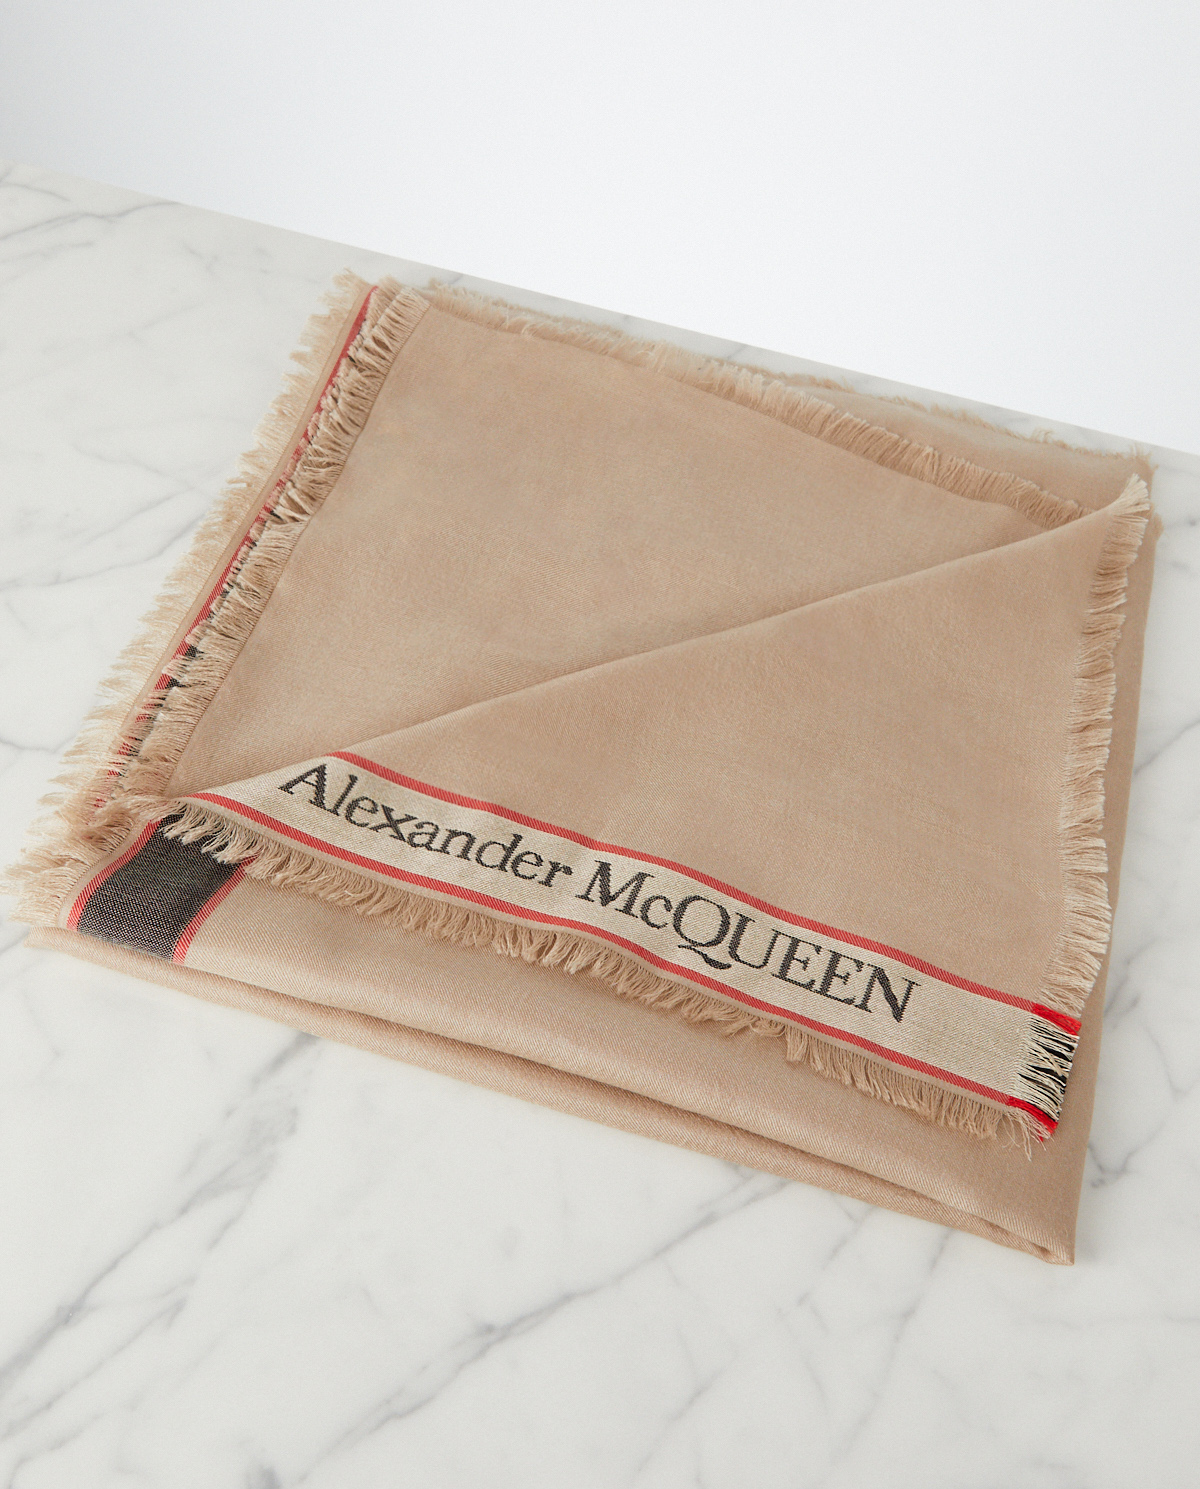 beżowa chusta z logo Alexander McQueen 615895 3807Q 9874